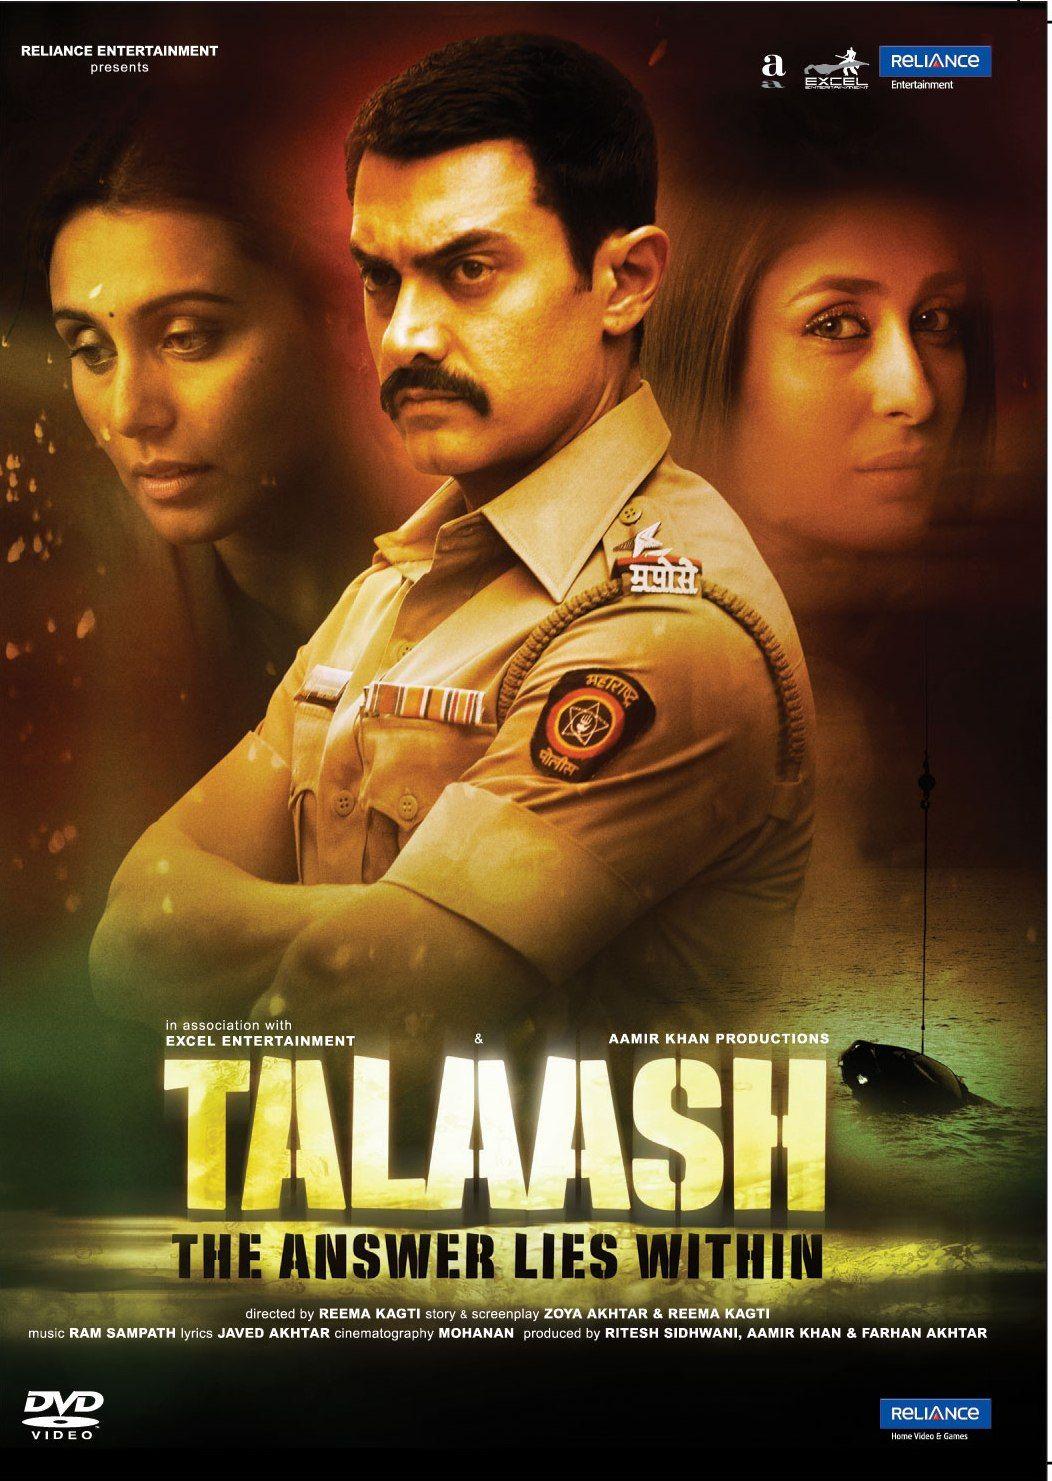 Talaash 2012 Hindi movies, Film, Bollywood